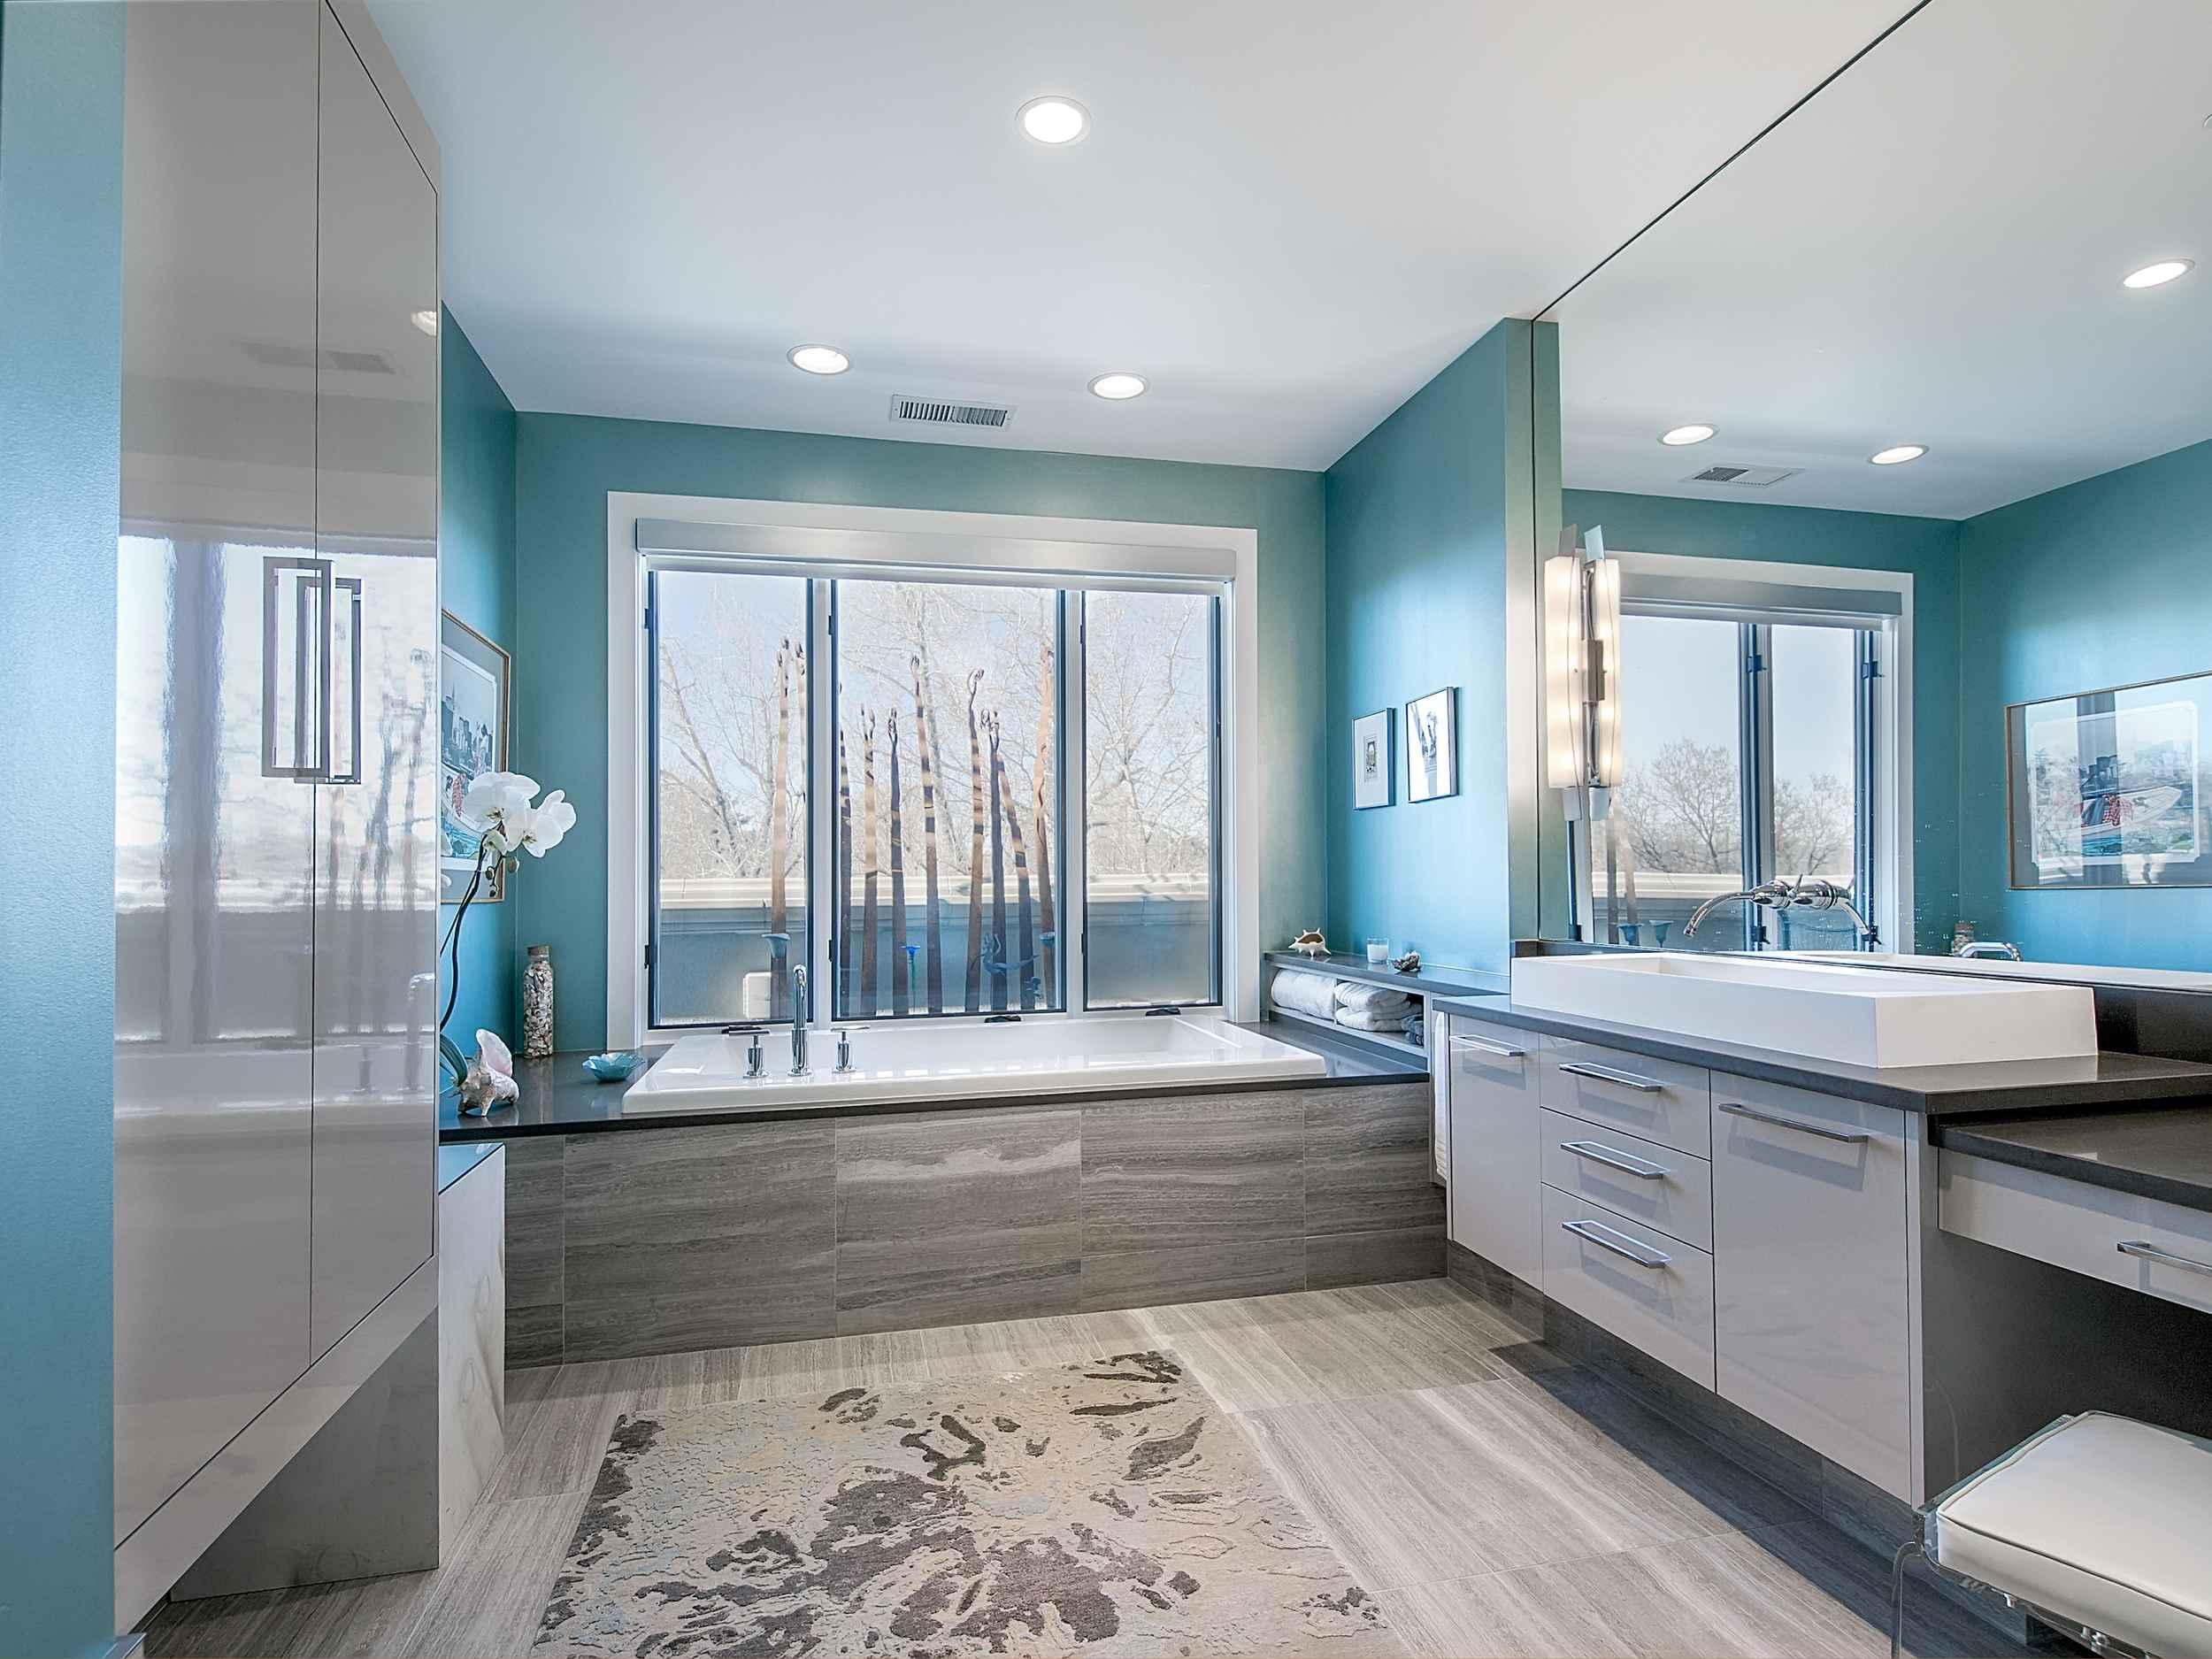 modern sanctuary — sanctuary kitchen and bath design-1.jpg